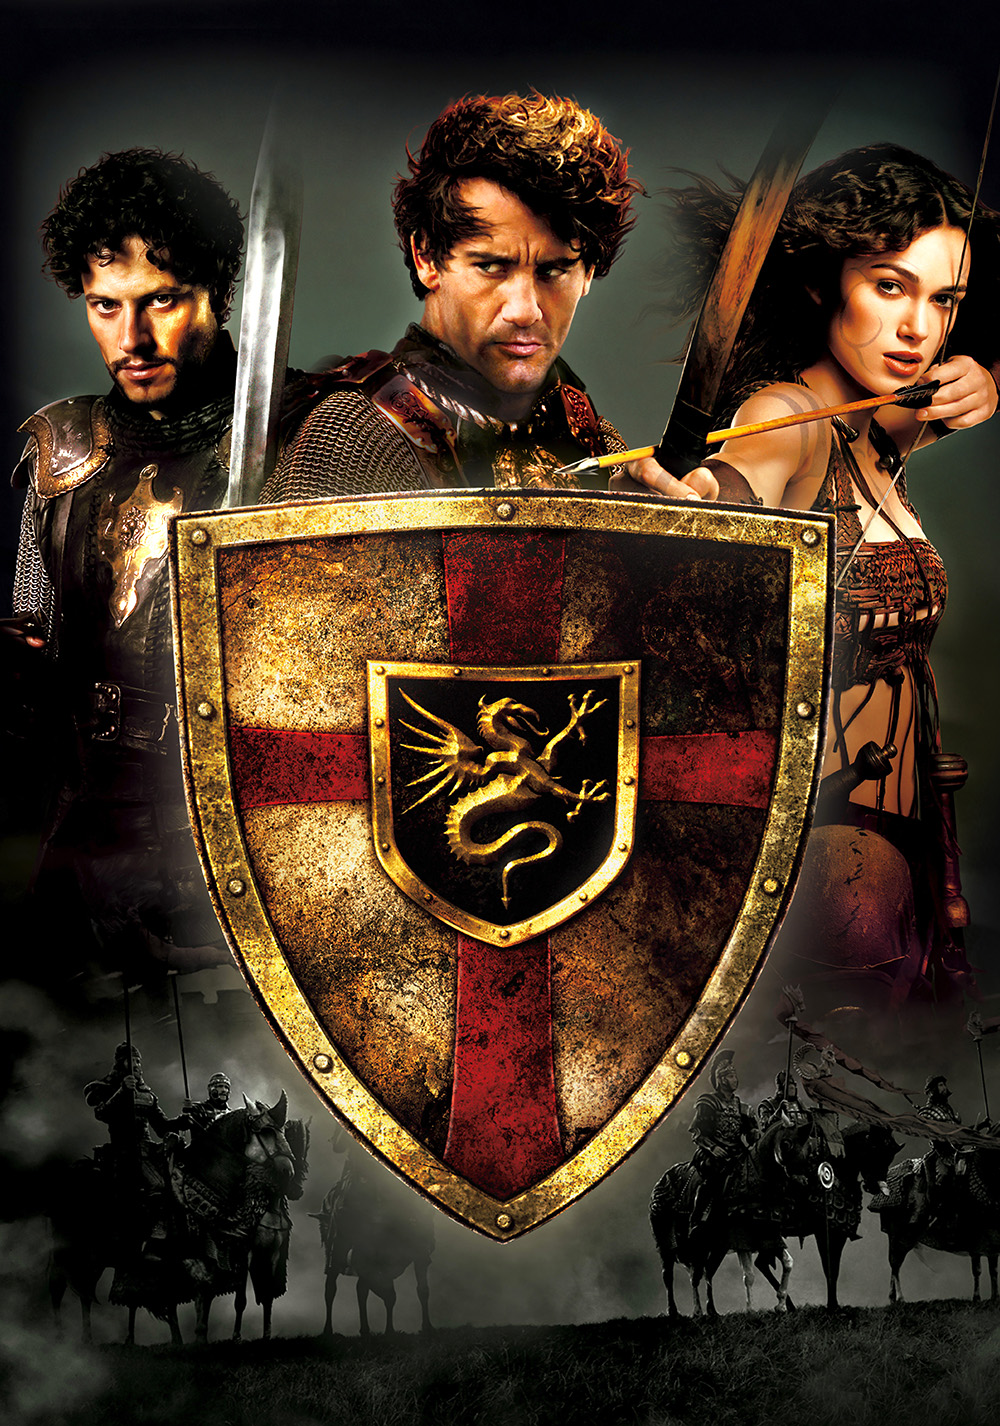 king arthur movie fanart fanarttv